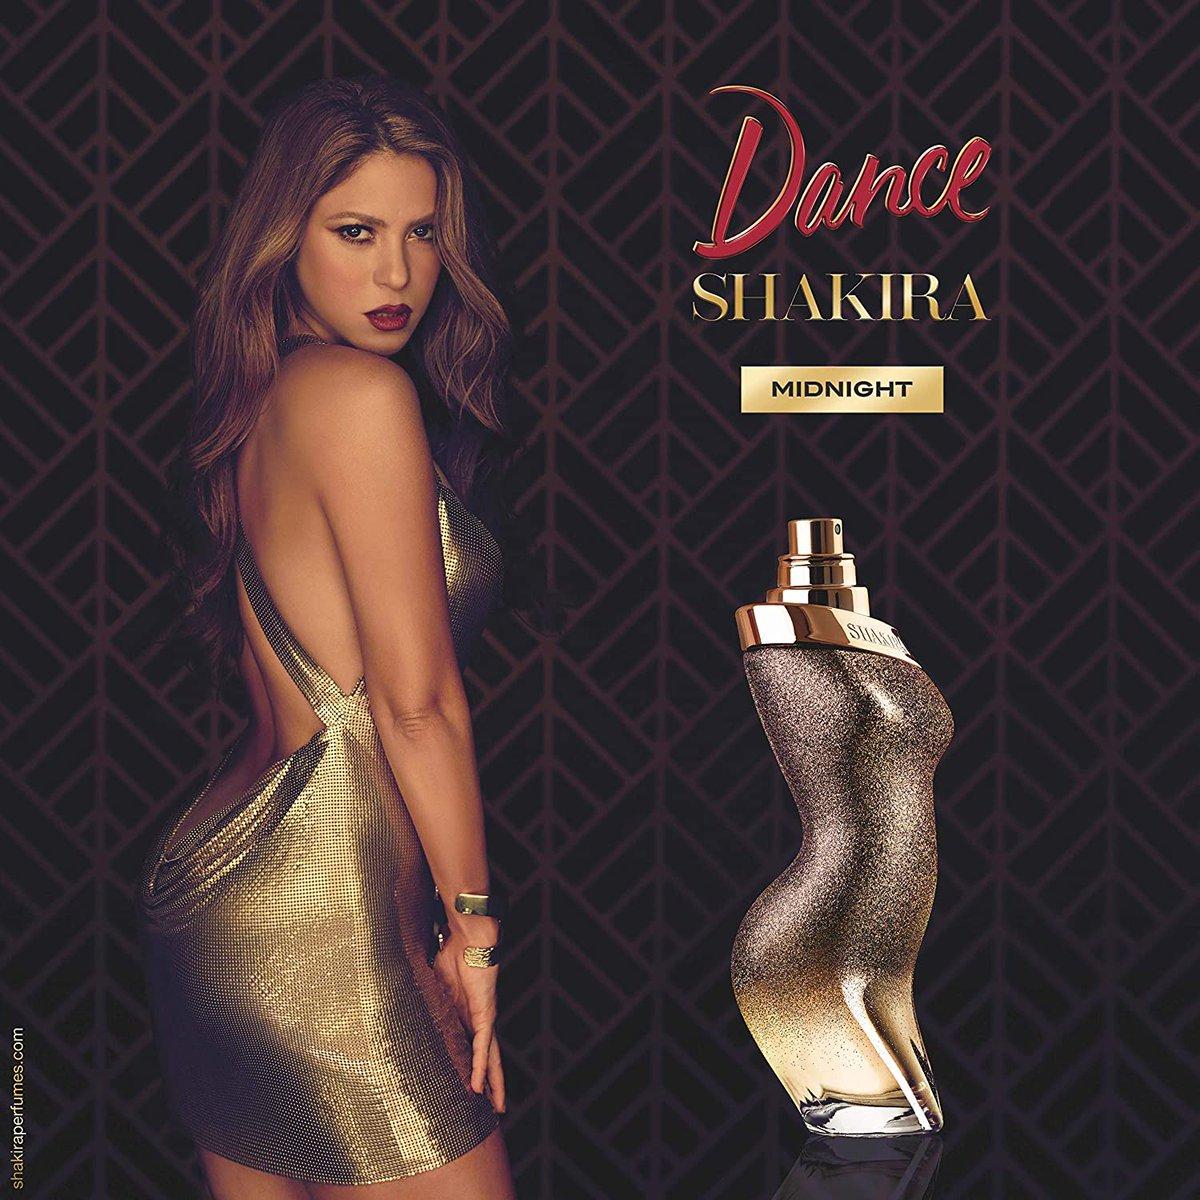 Shakira >> preparando nuevo álbum - Página 8 EcmaSJSXoAUYNff?format=jpg&name=medium